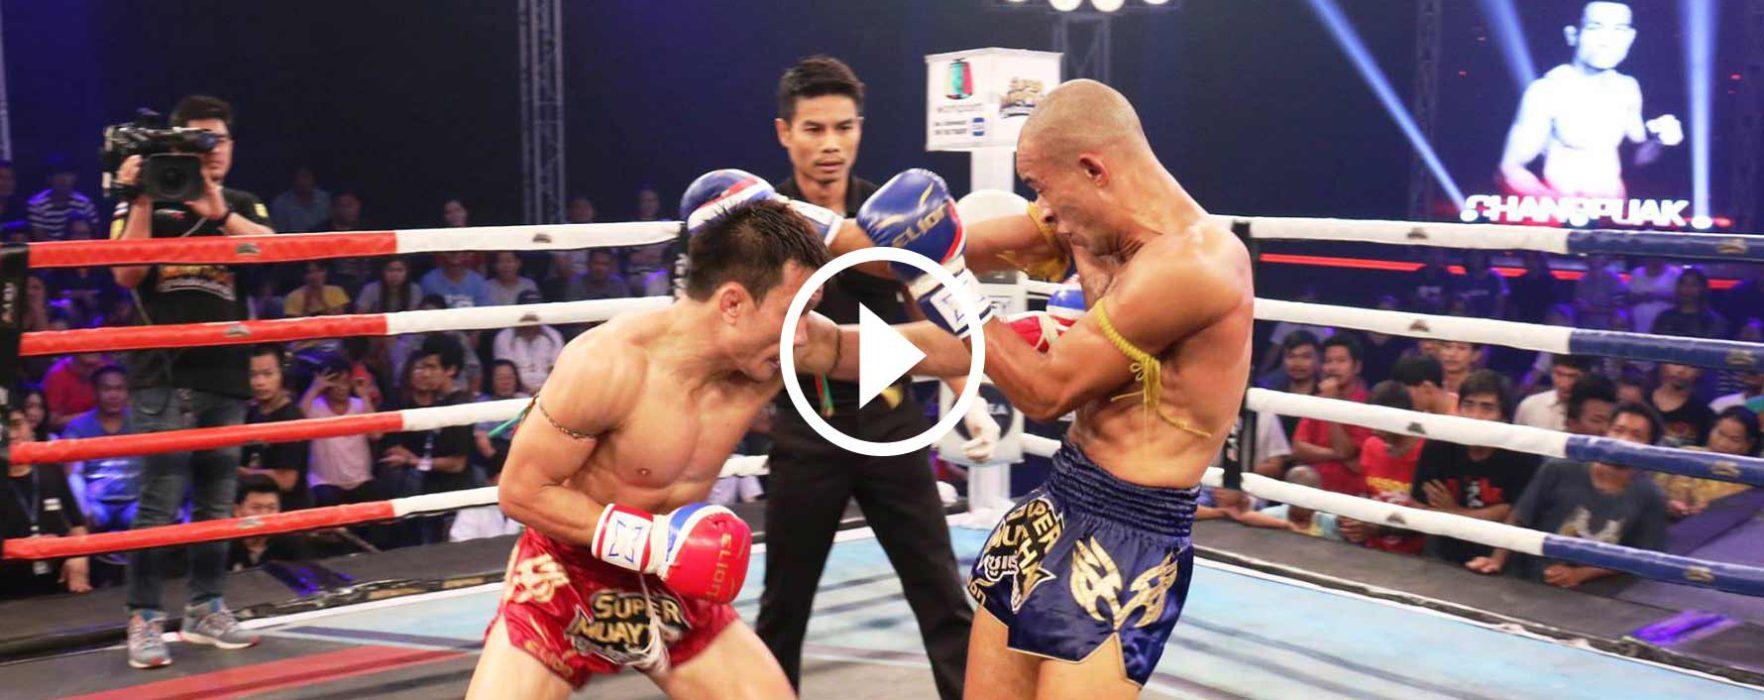 Video: Christian Zahe vs Changpuak Jetsada Pongtong – Super Muay Thai Marathon – 31st July 2016